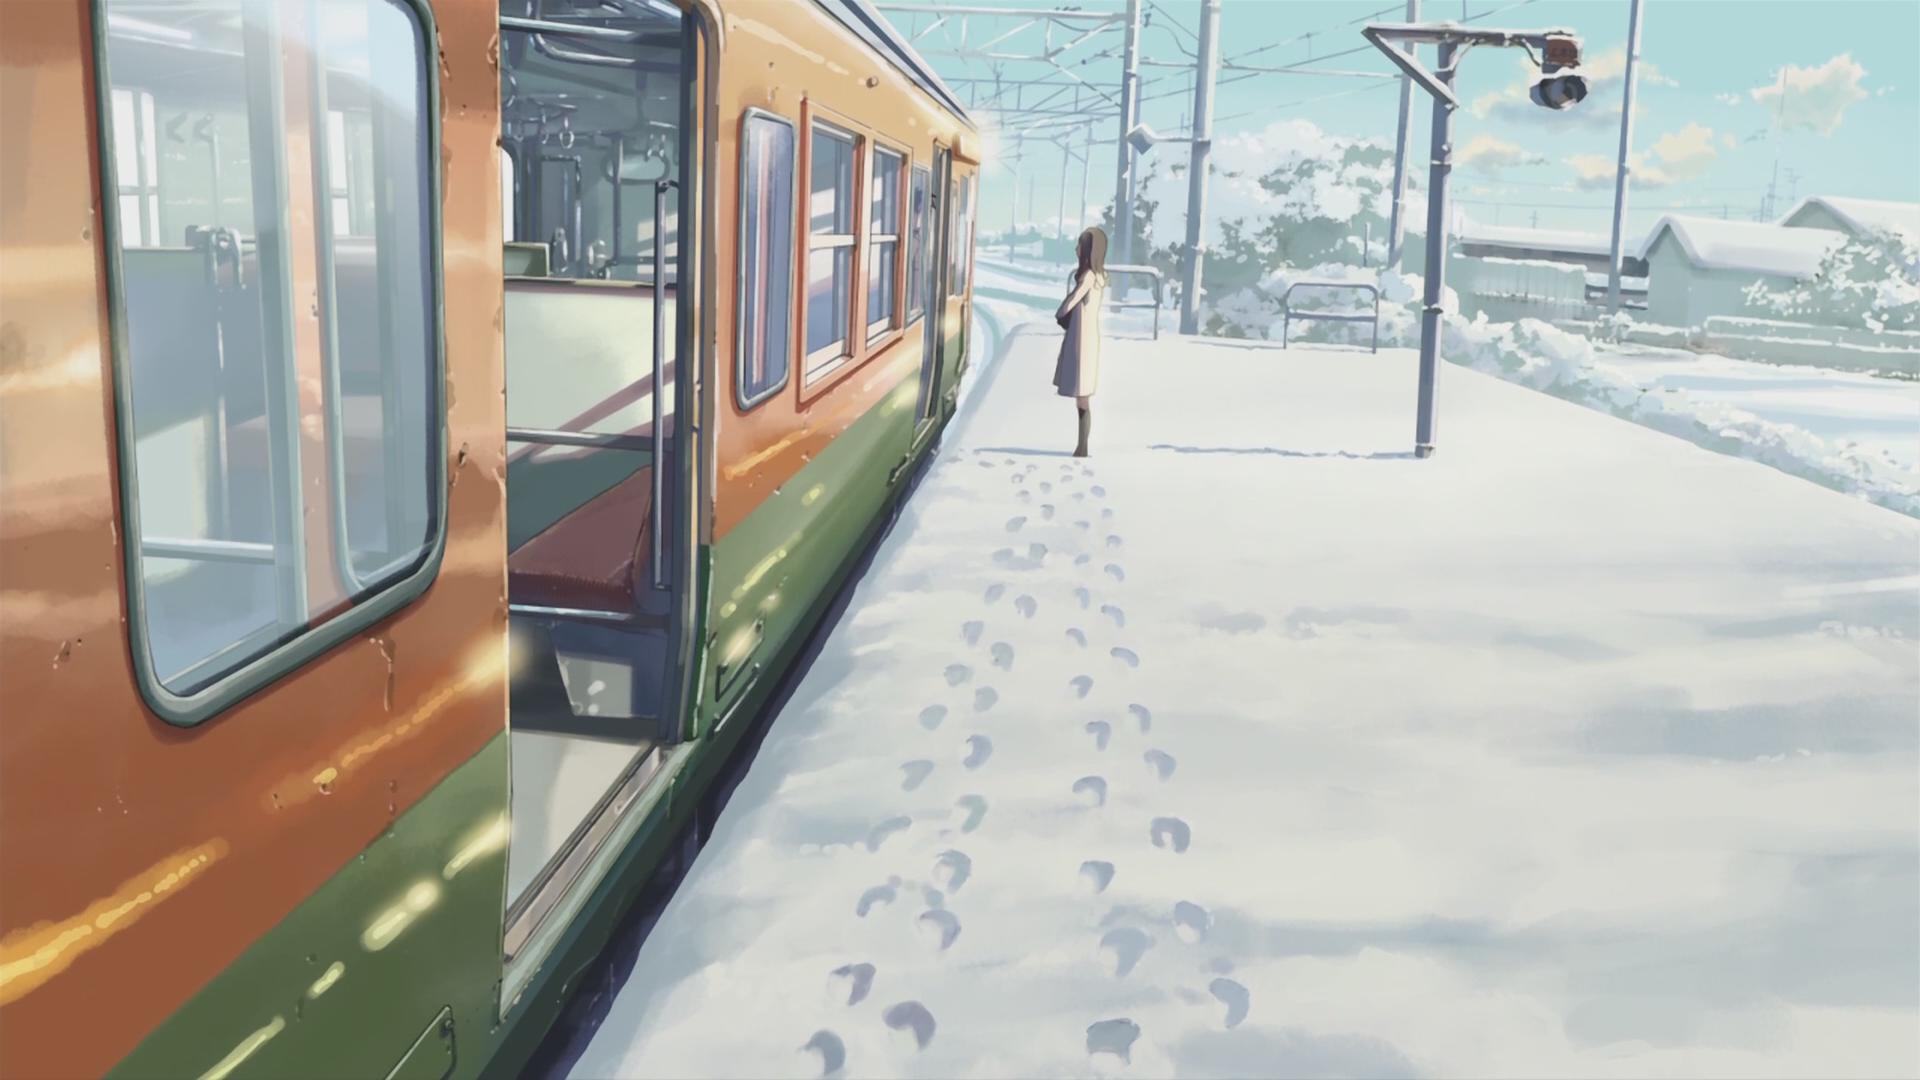 Winter Women Train Train Station Anime 5 Centimeters Per Second Snow Makoto Shinkai Footprints Power Lines